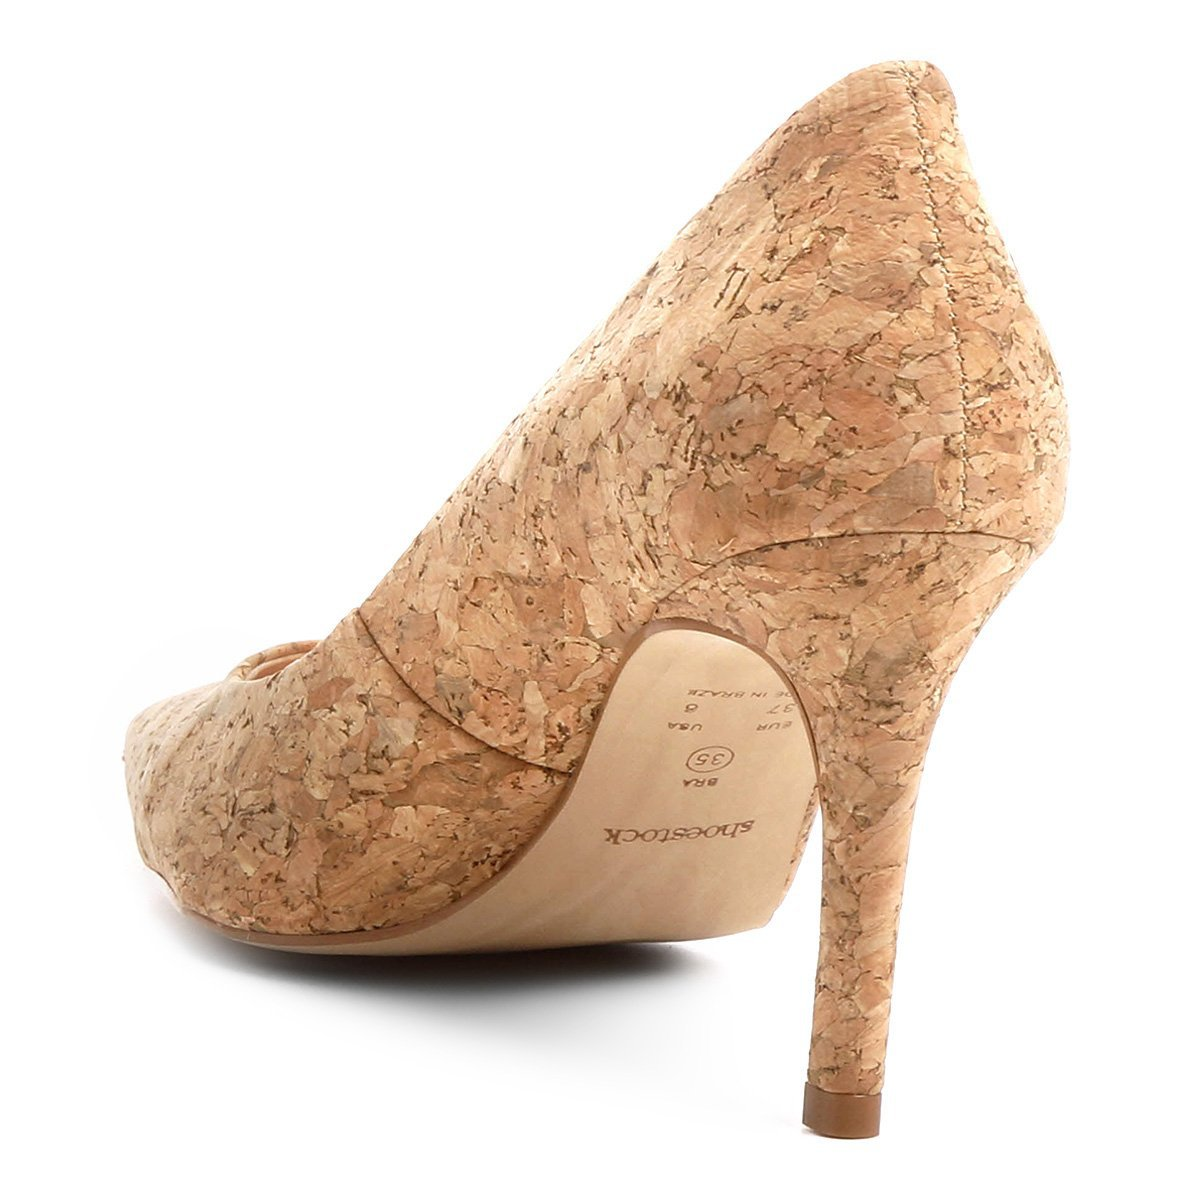 Salto Shoestock Salto Cortiça Bege Alto Alto Shoestock Cortiça Scarpin Salto Scarpin Alto Scarpin Shoestock Bege Cortiça AwEP7xpgq